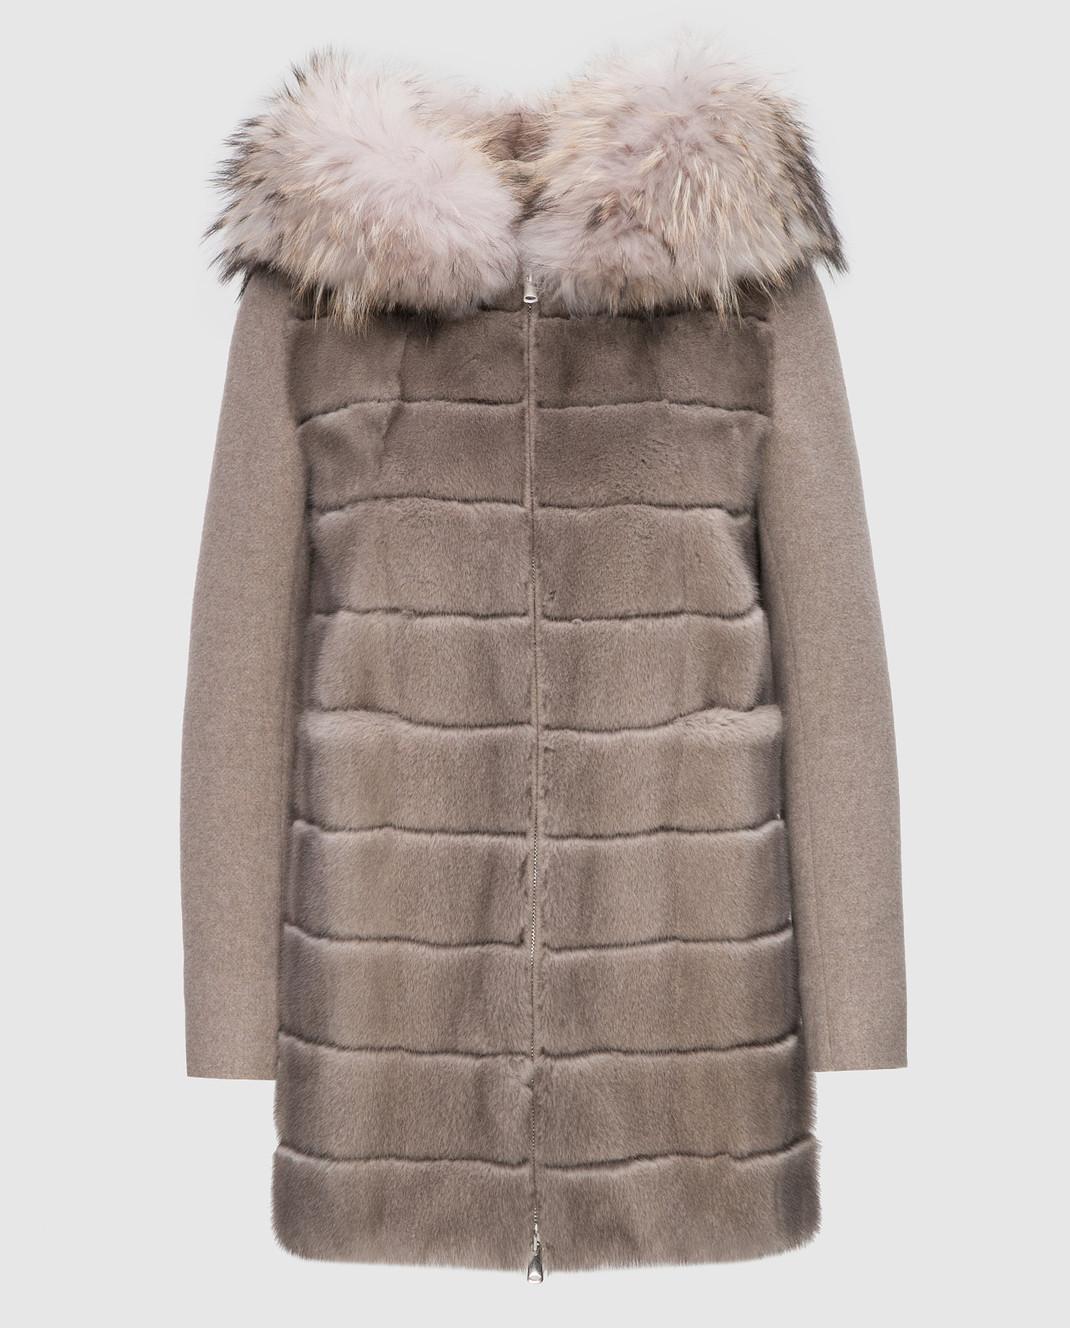 Real Furs House Бежевое пальто с мехом енота 922RFH